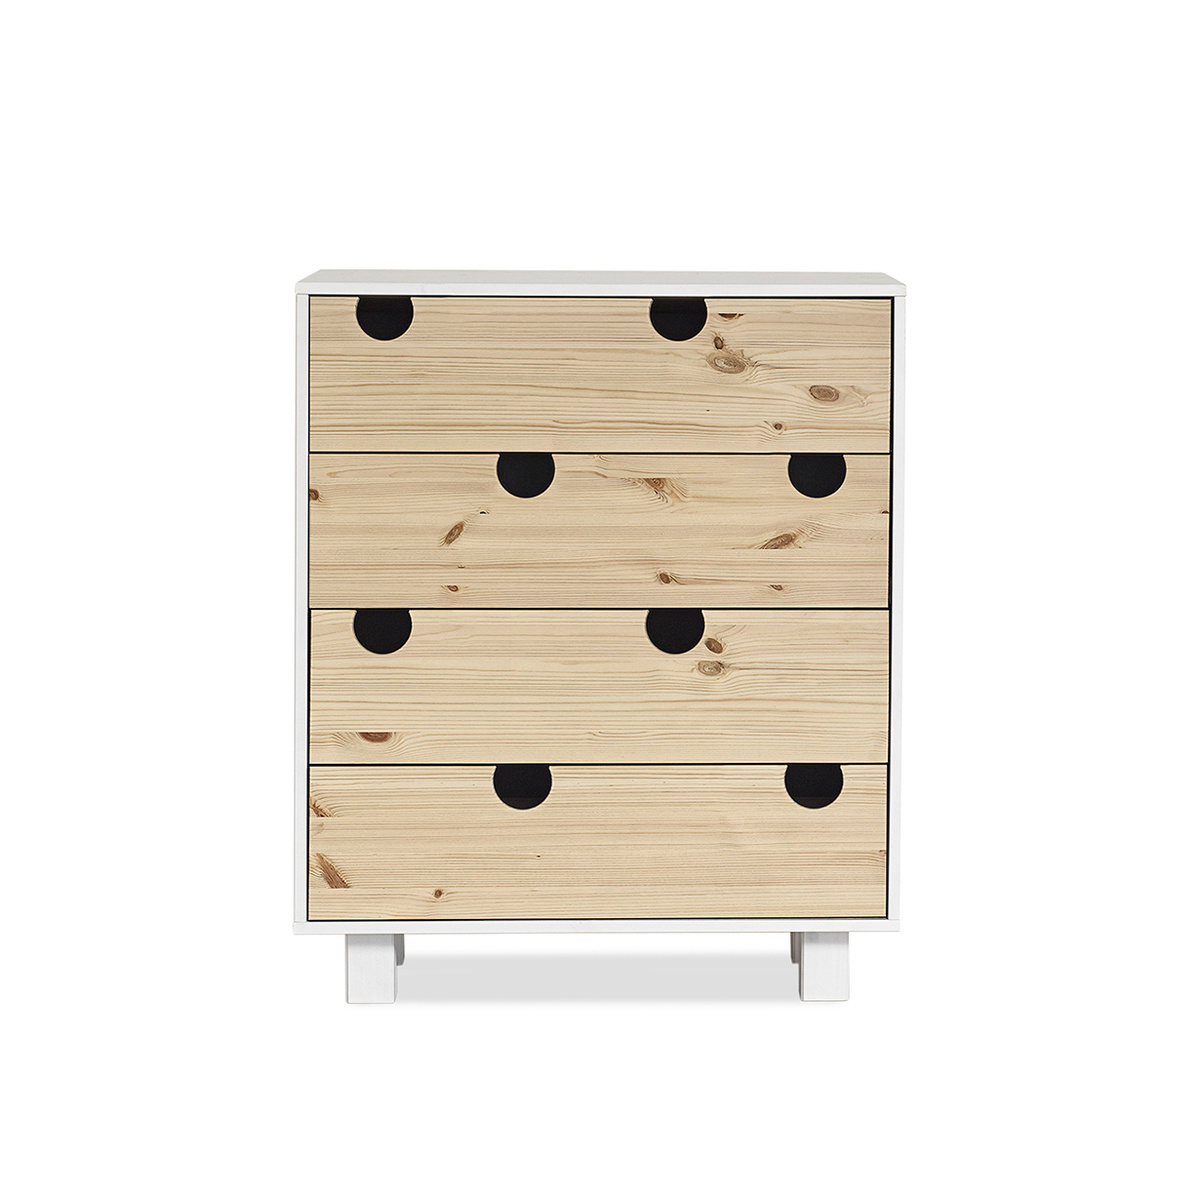 Cabinet din lemn de pin cu 4 sertare House White / Nature l40xL75xh90 cm